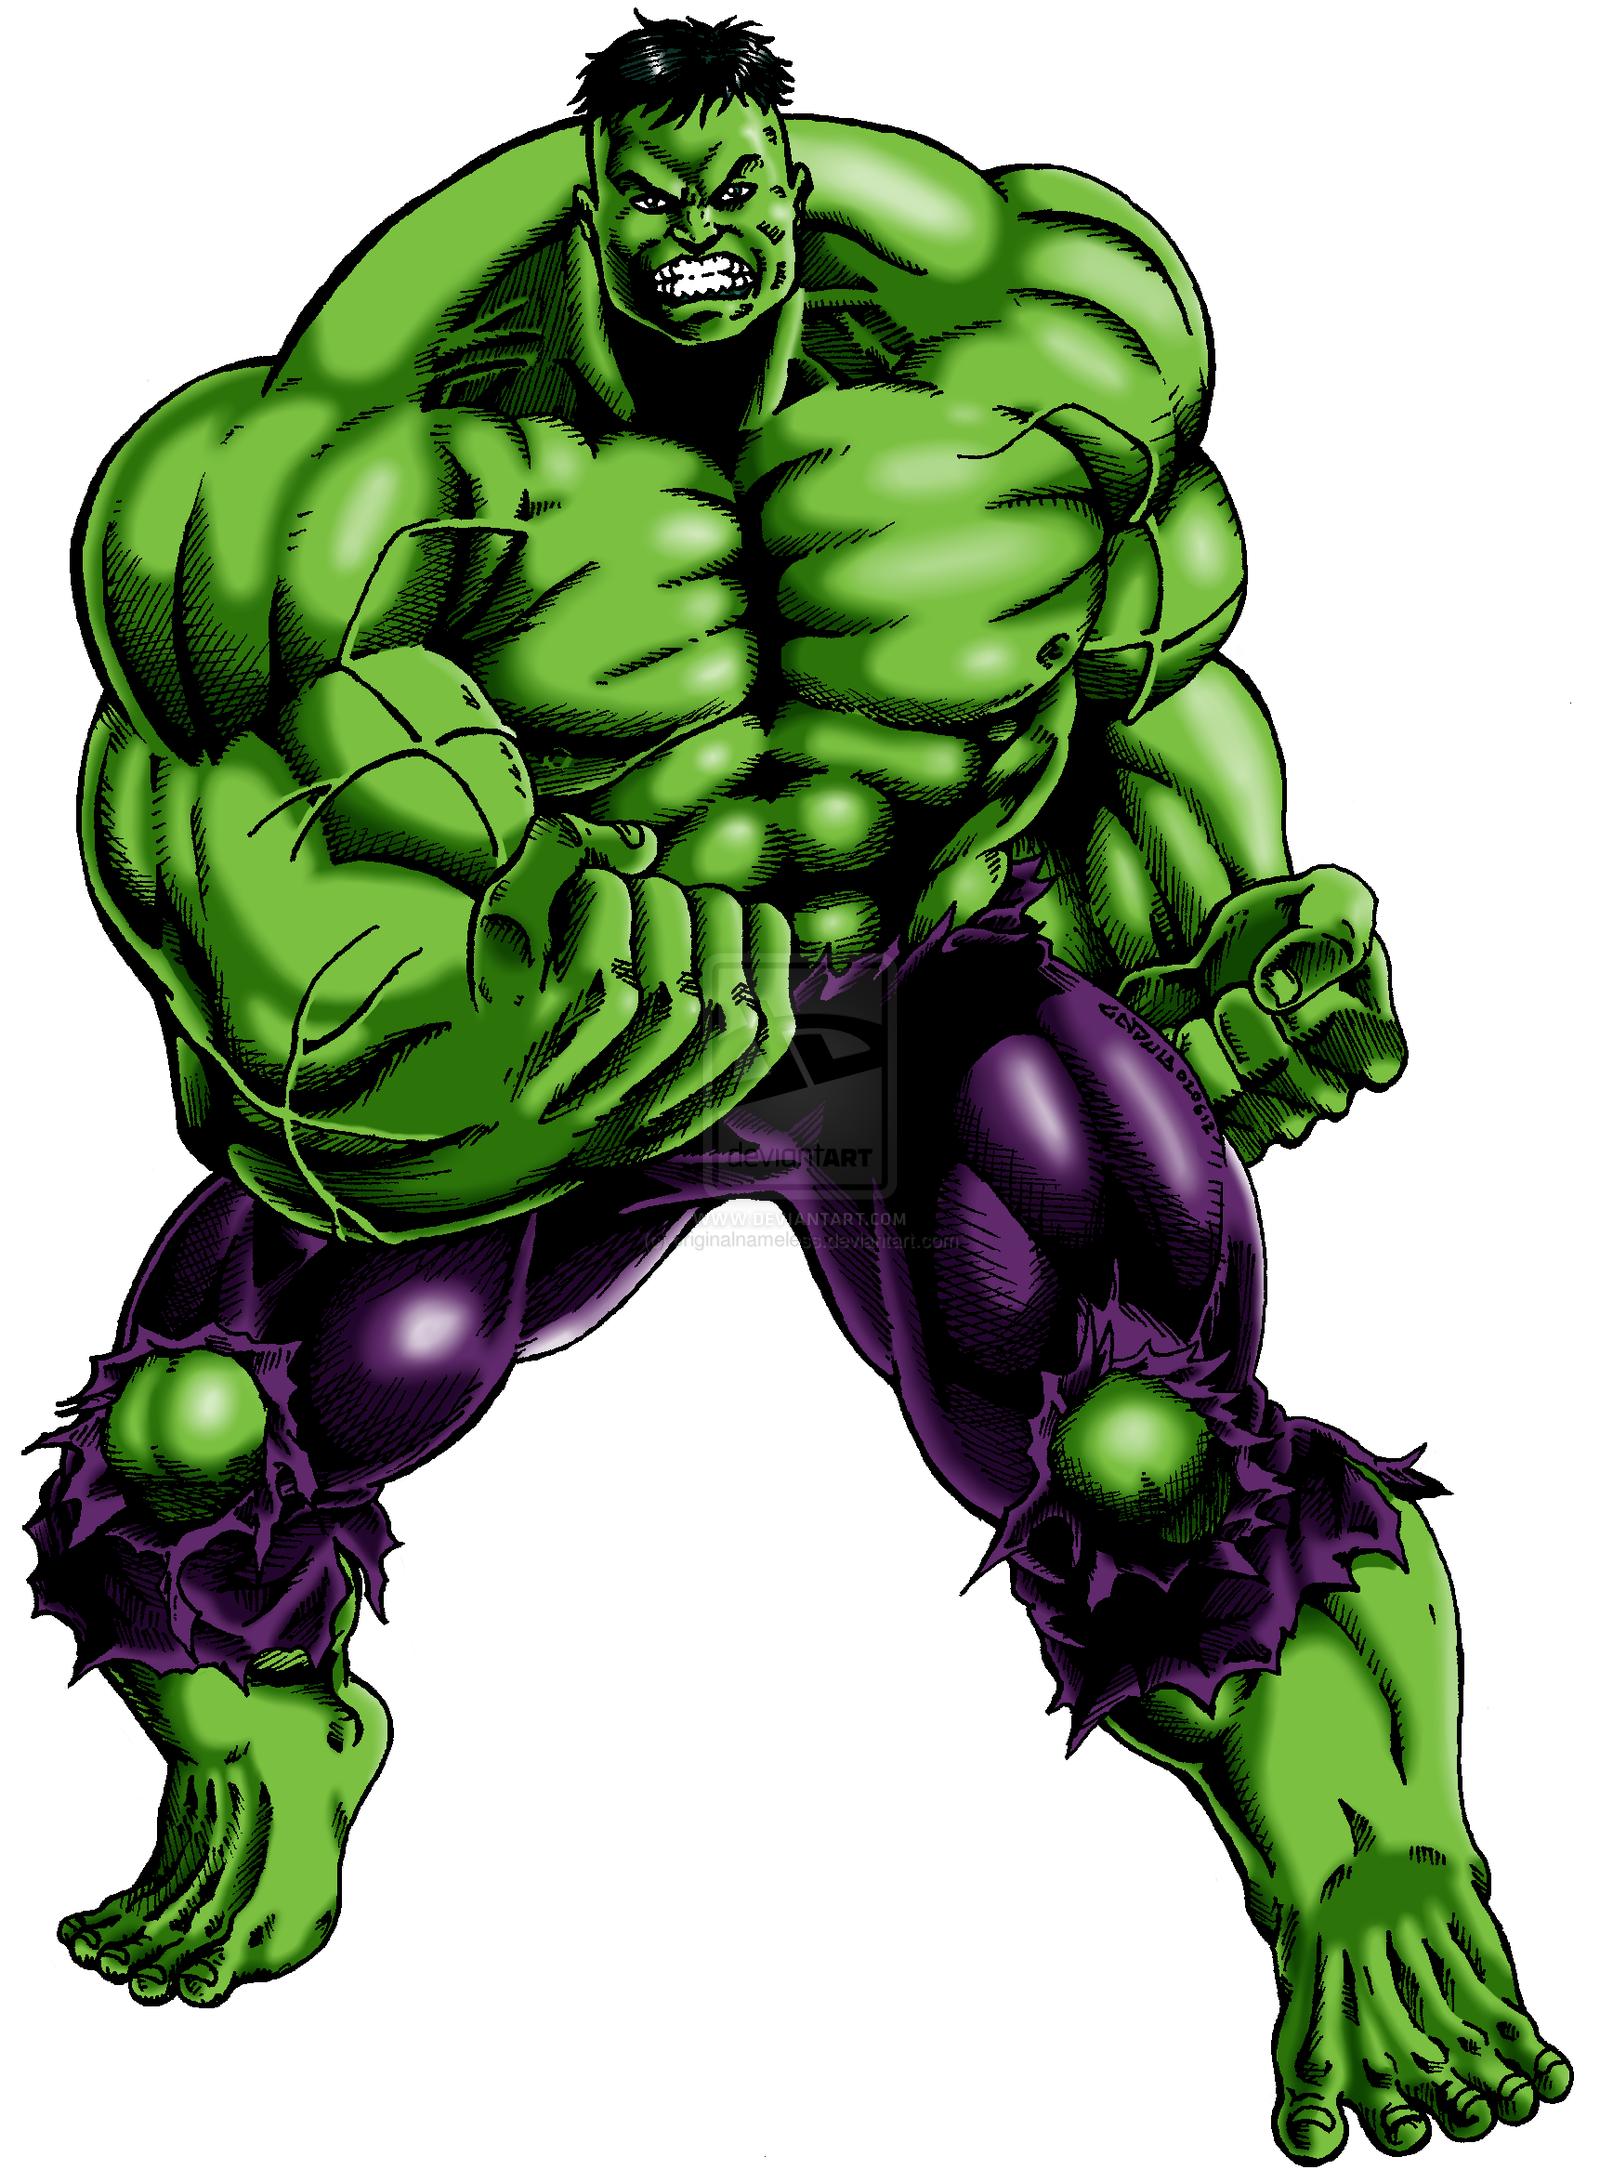 Incredible Hulk Cartoon drawing free image